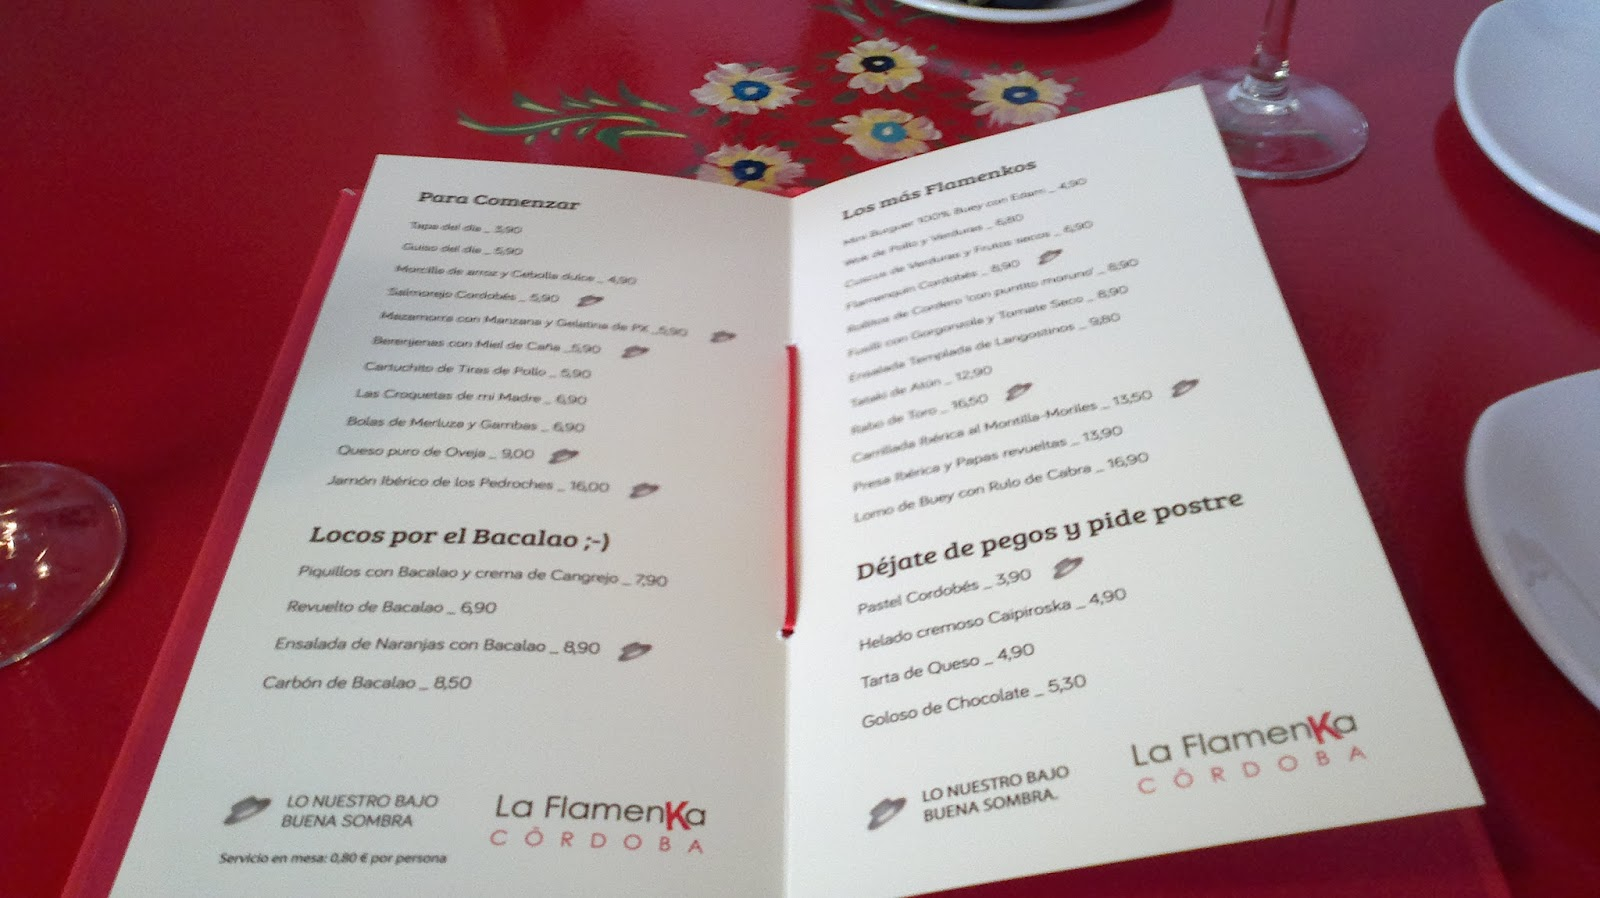 Aderramar vinos la flamenka m s que un restaurante - Cocina 33 cordoba ...